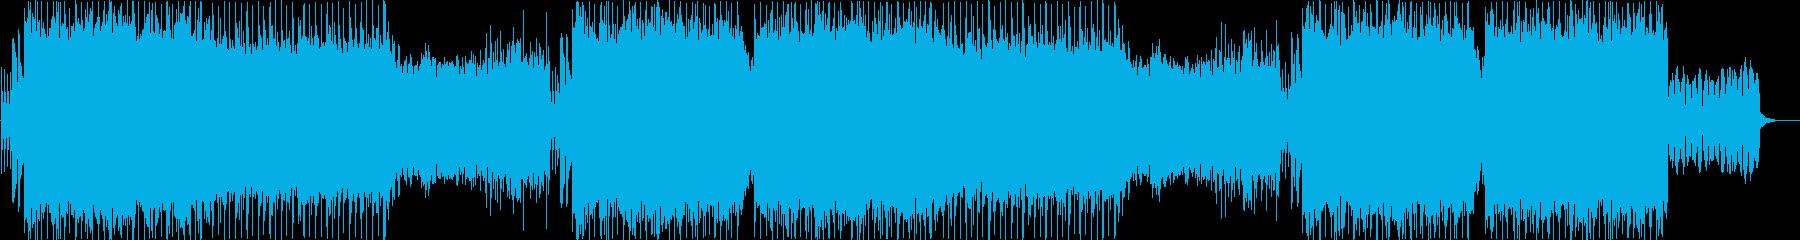 EDM・エモーショナル・挑戦・CMの再生済みの波形